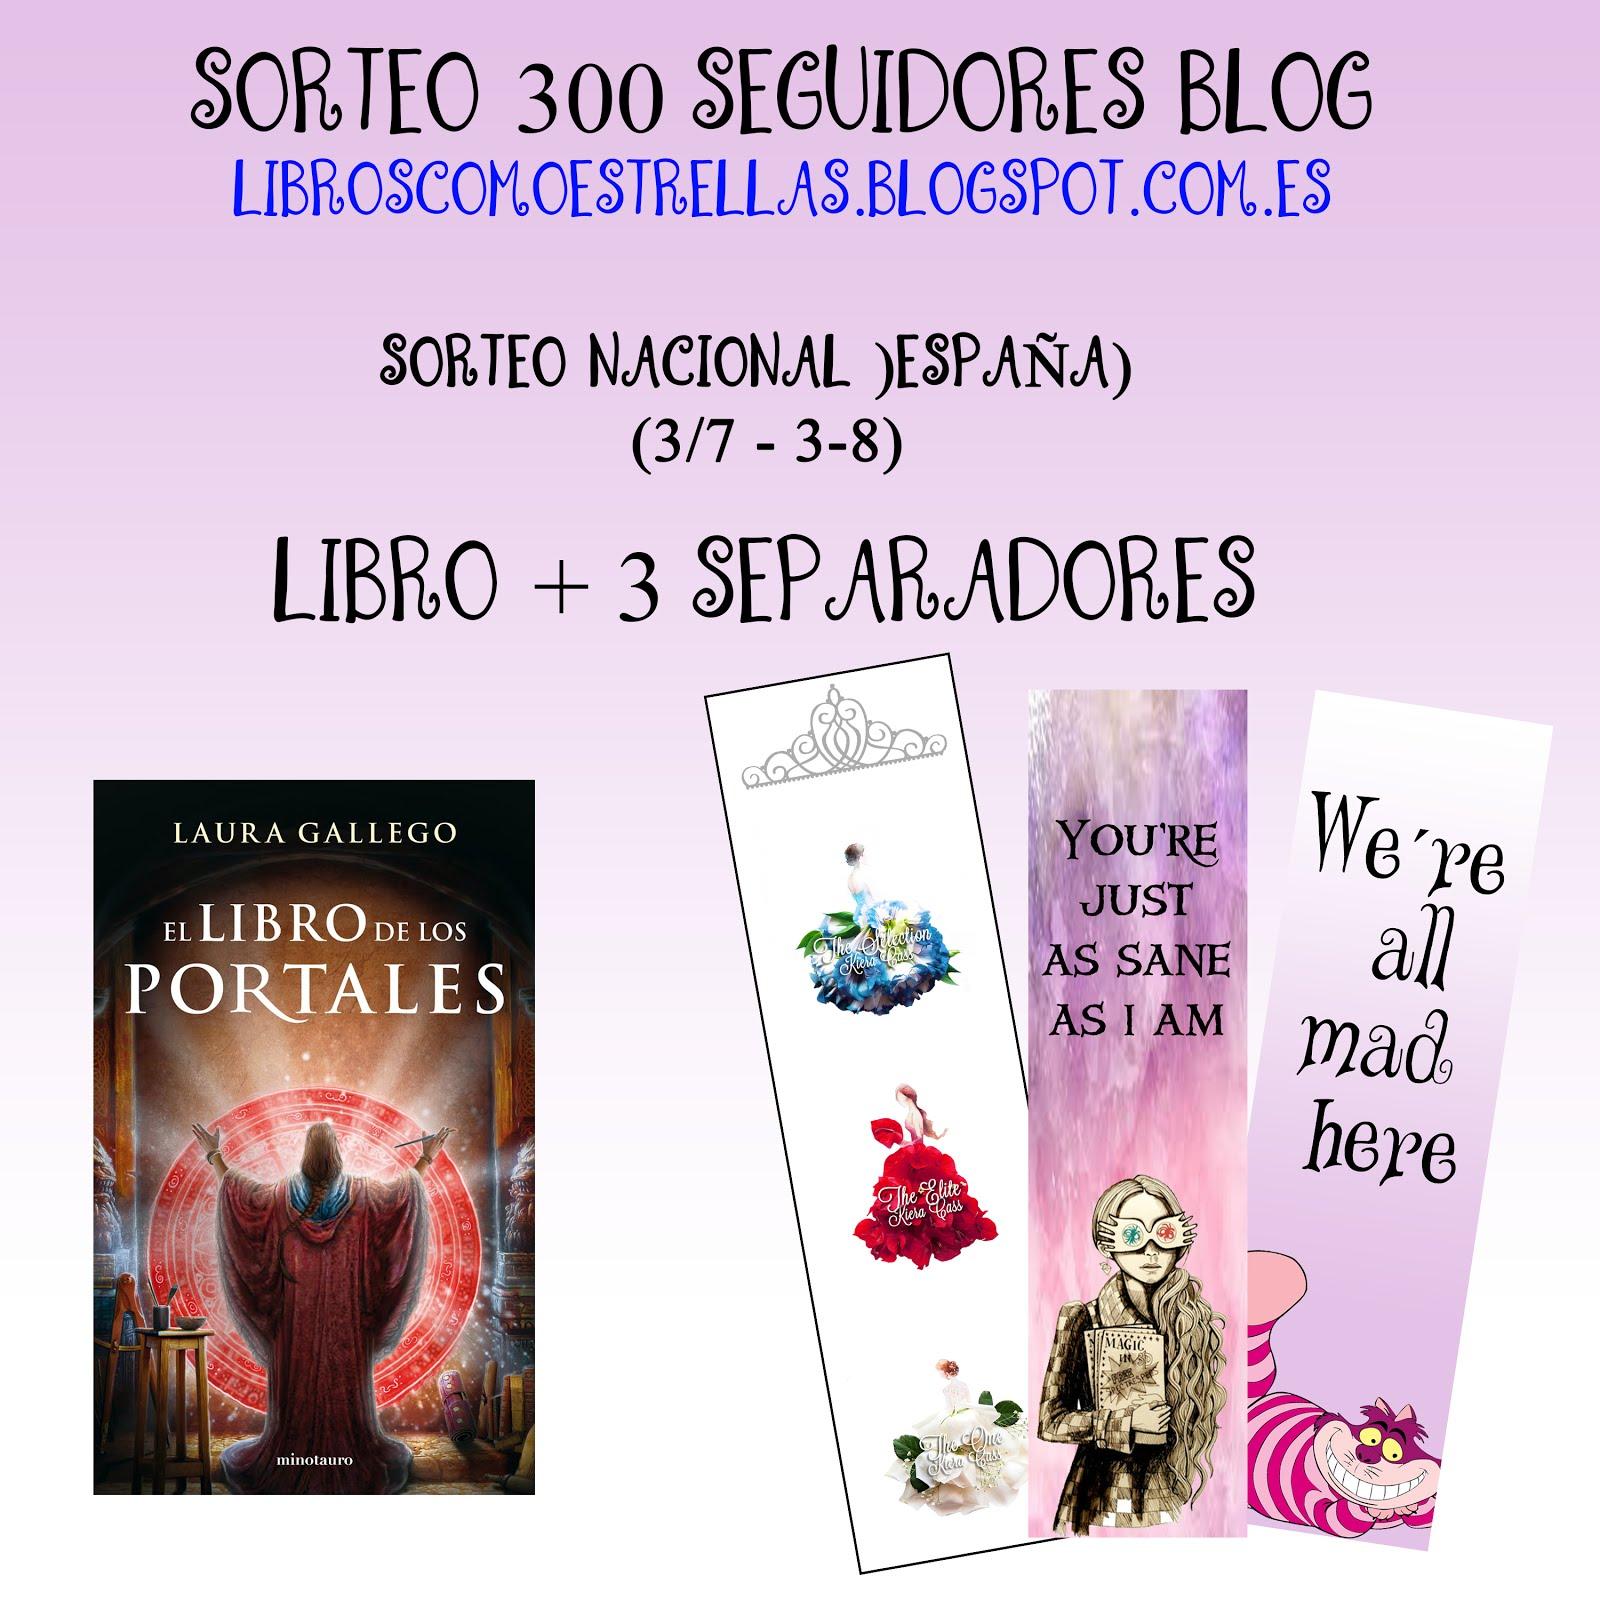 SORTEO 300 ACTIVO